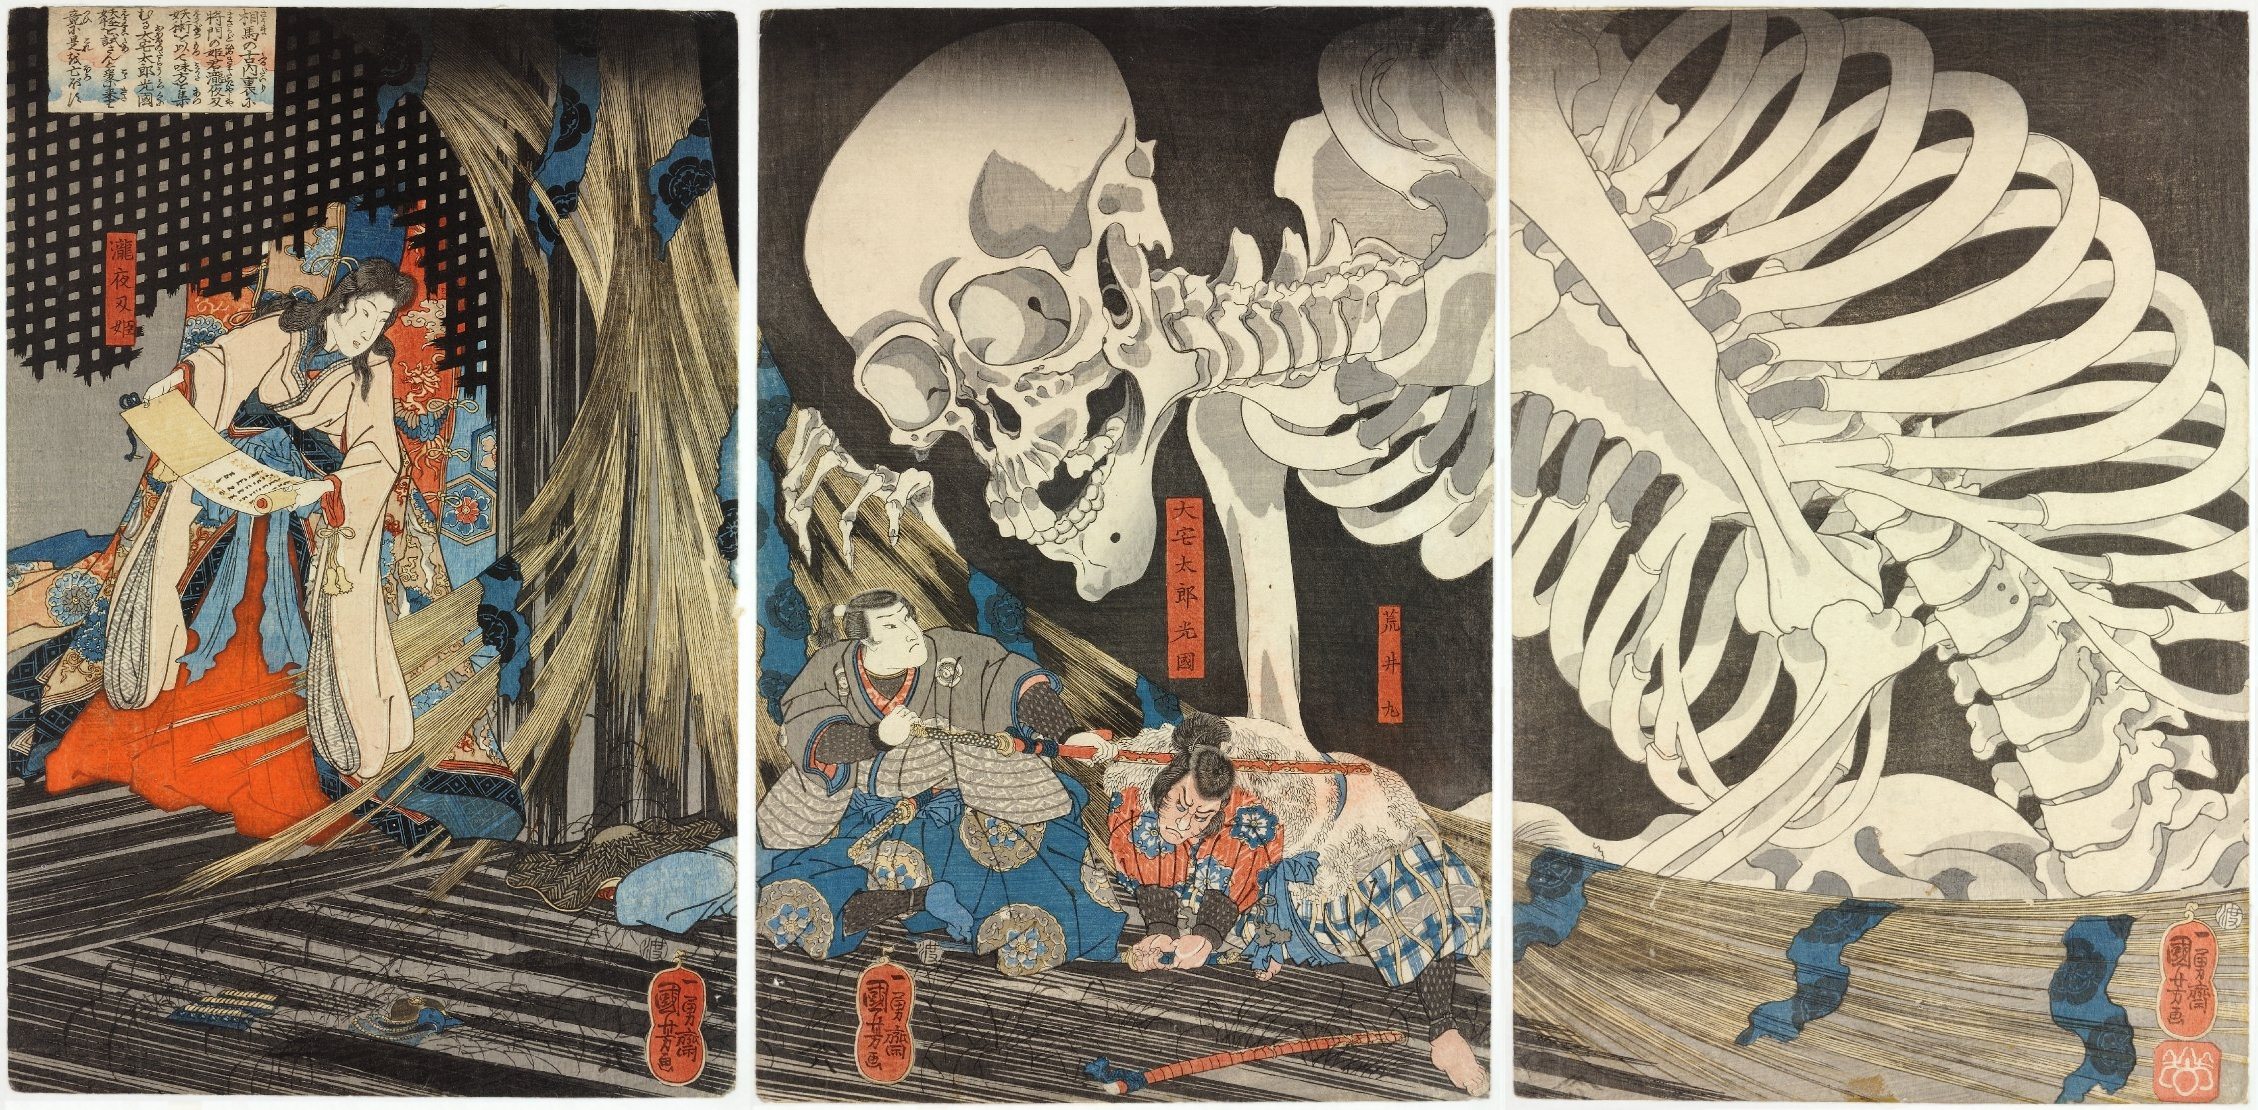 Takiyasha the Witch & the Skeleton Spectre depicting a  Gashadokuro